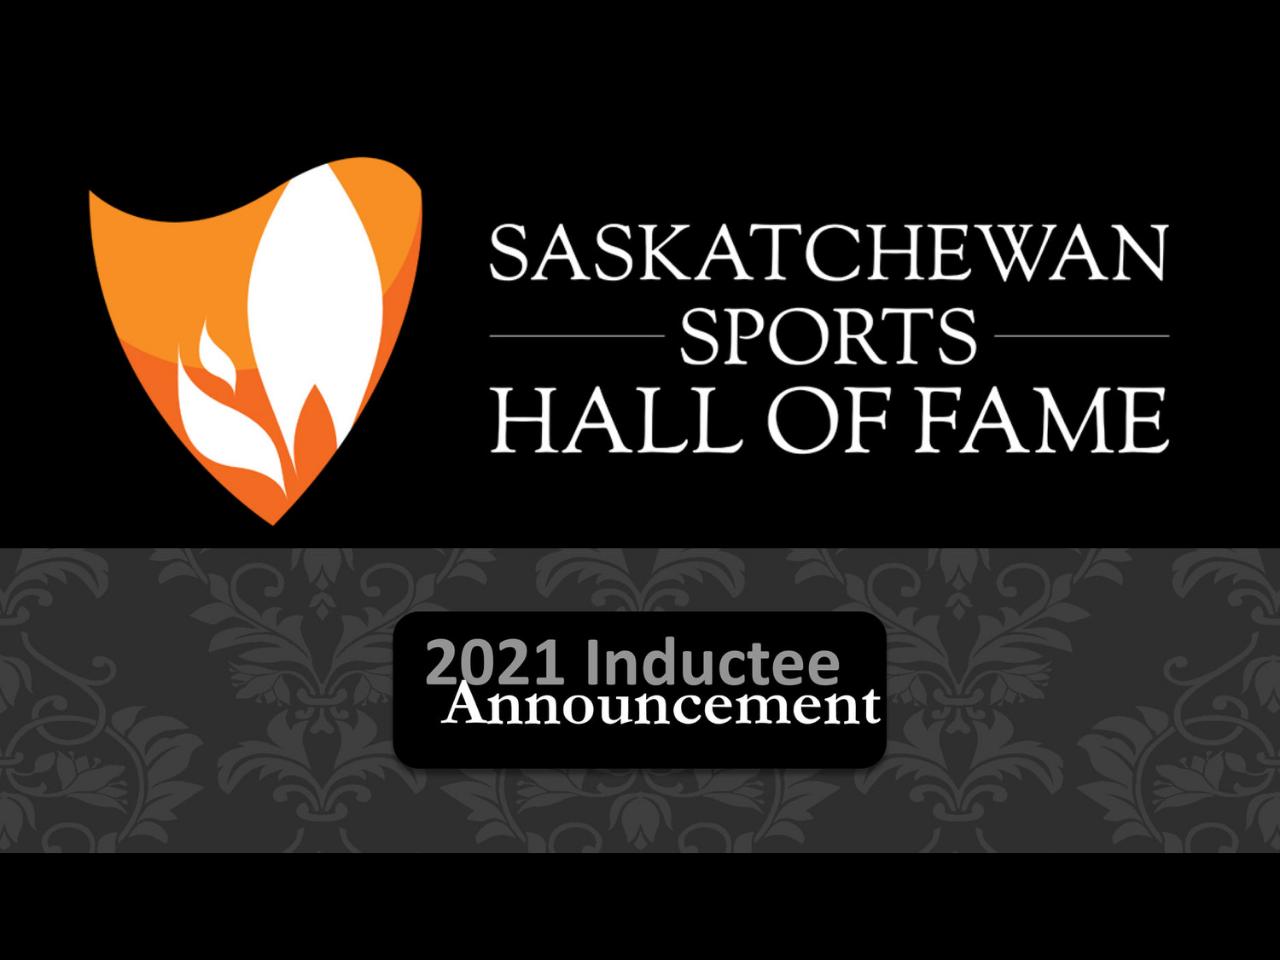 Saskatchewan Sports Hall of Fame announces 2021 inductees